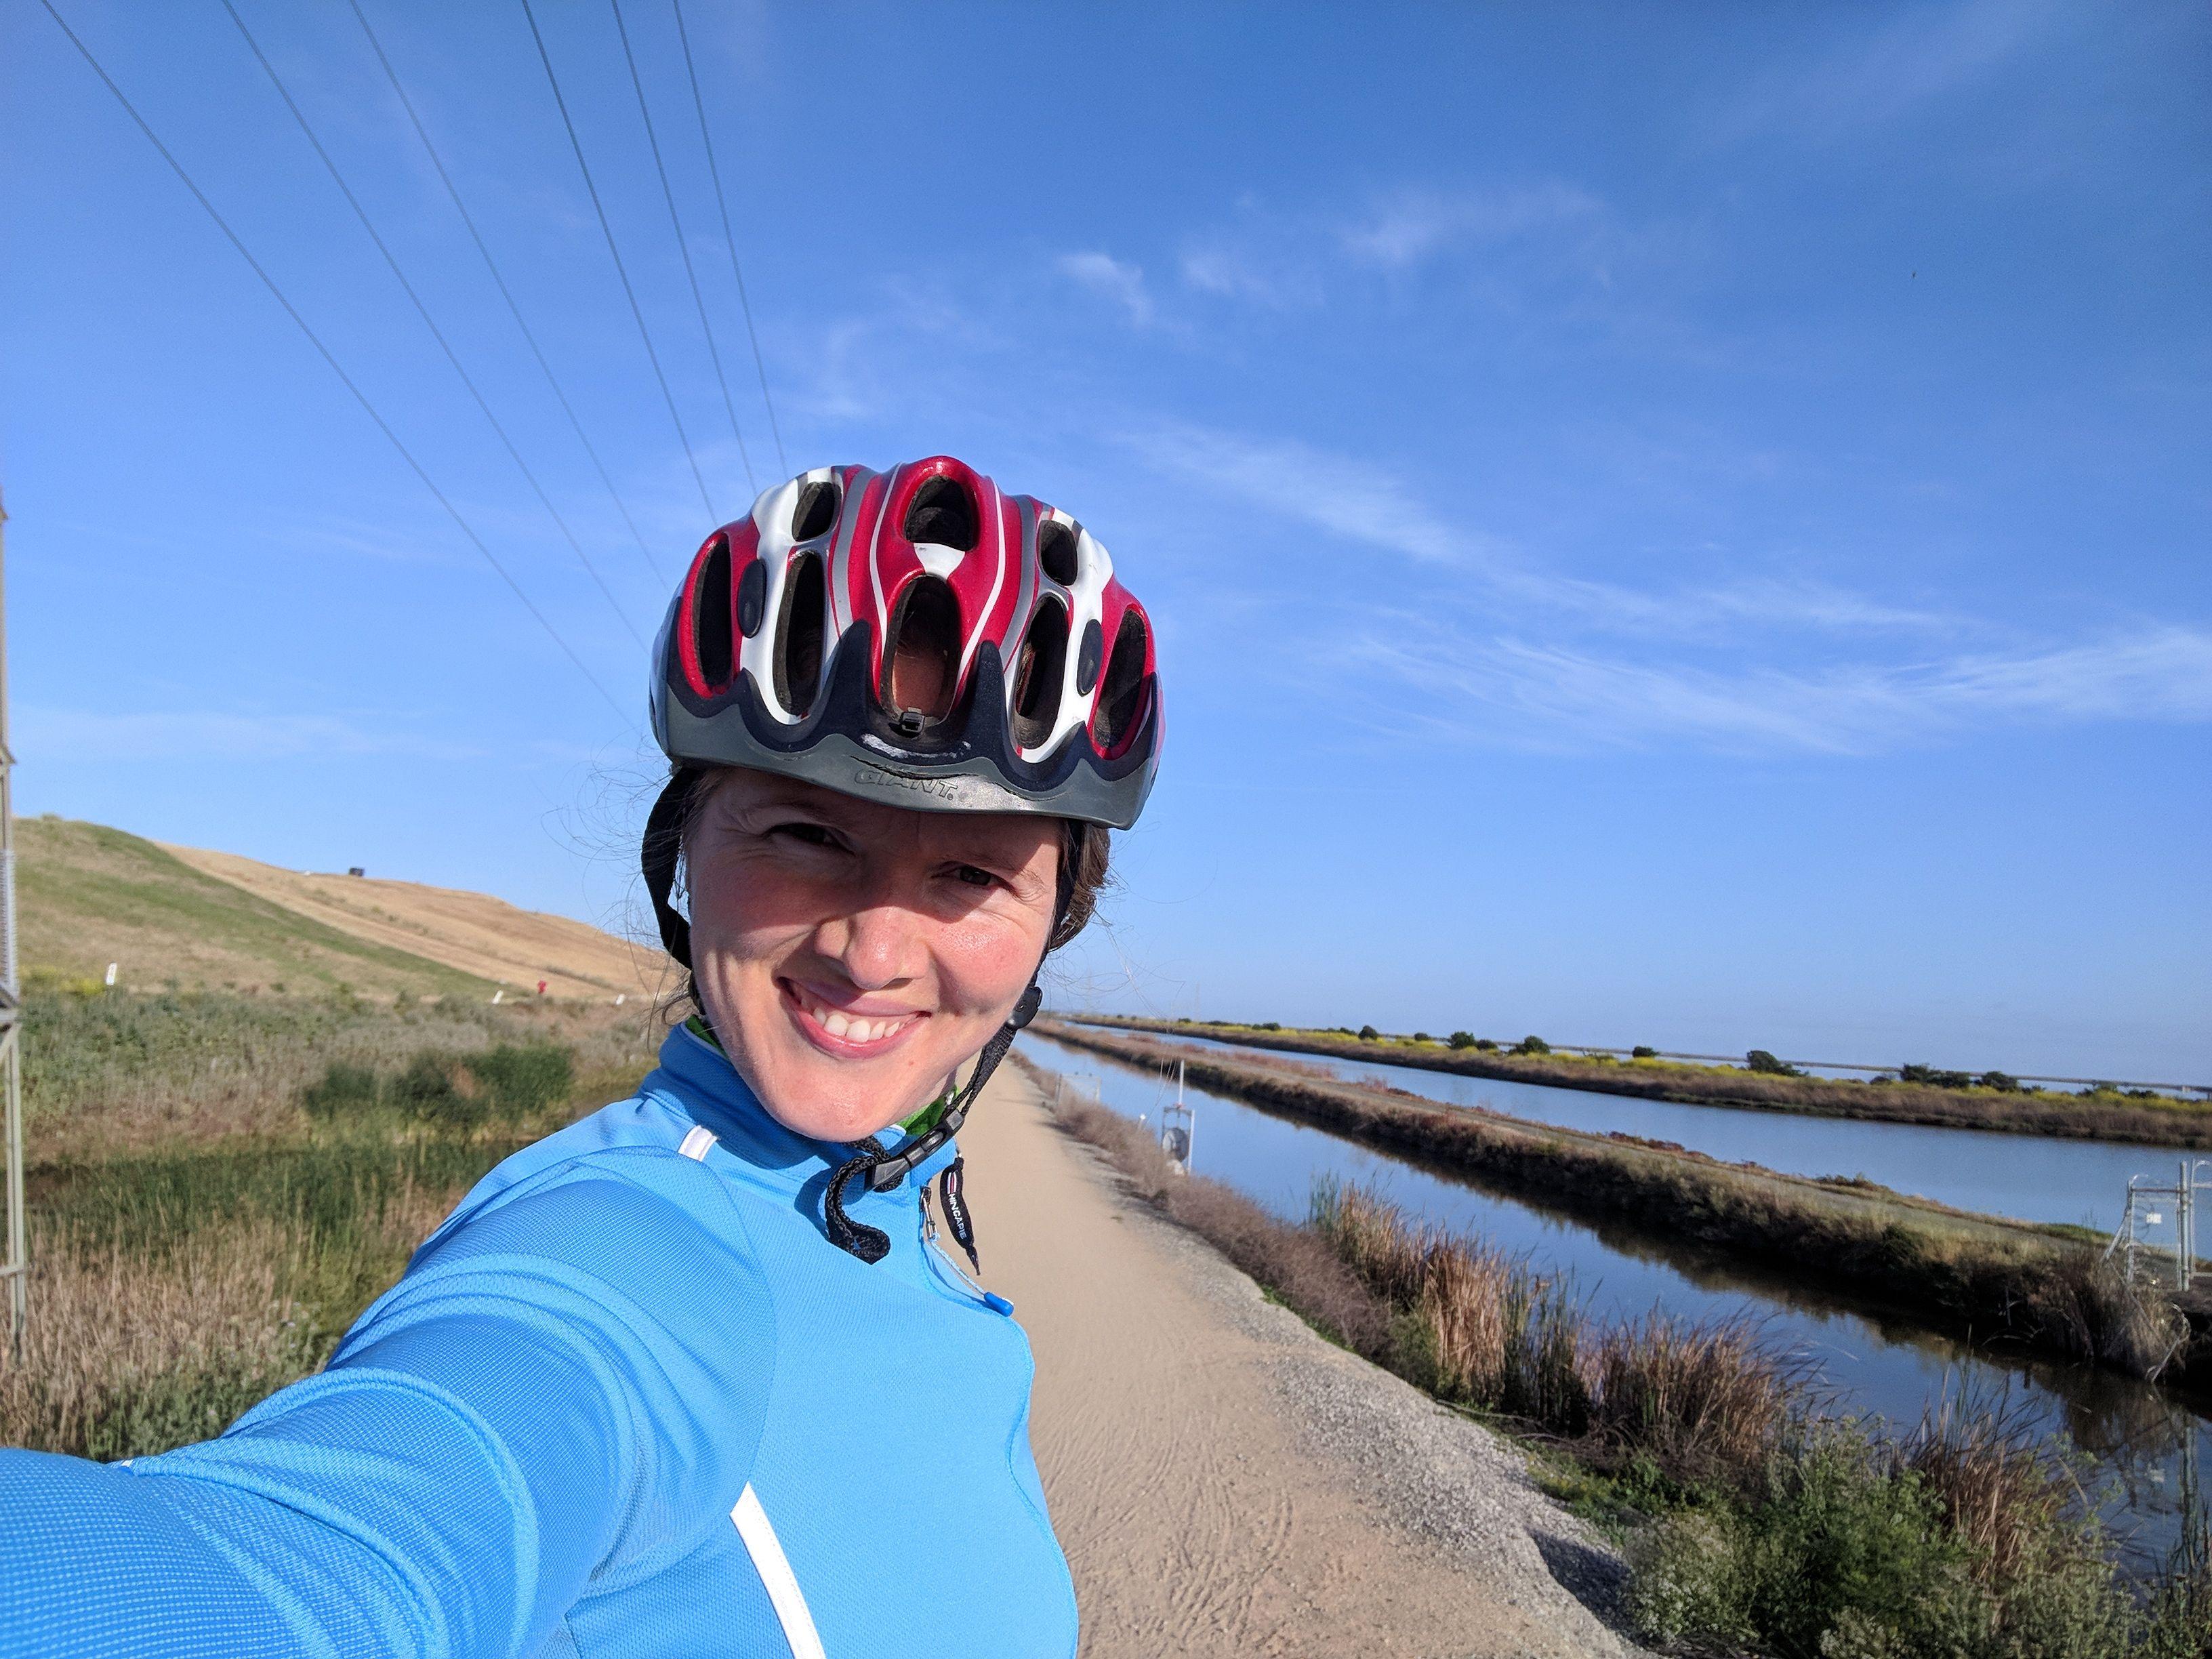 Diana biking along the San Francisco Bay